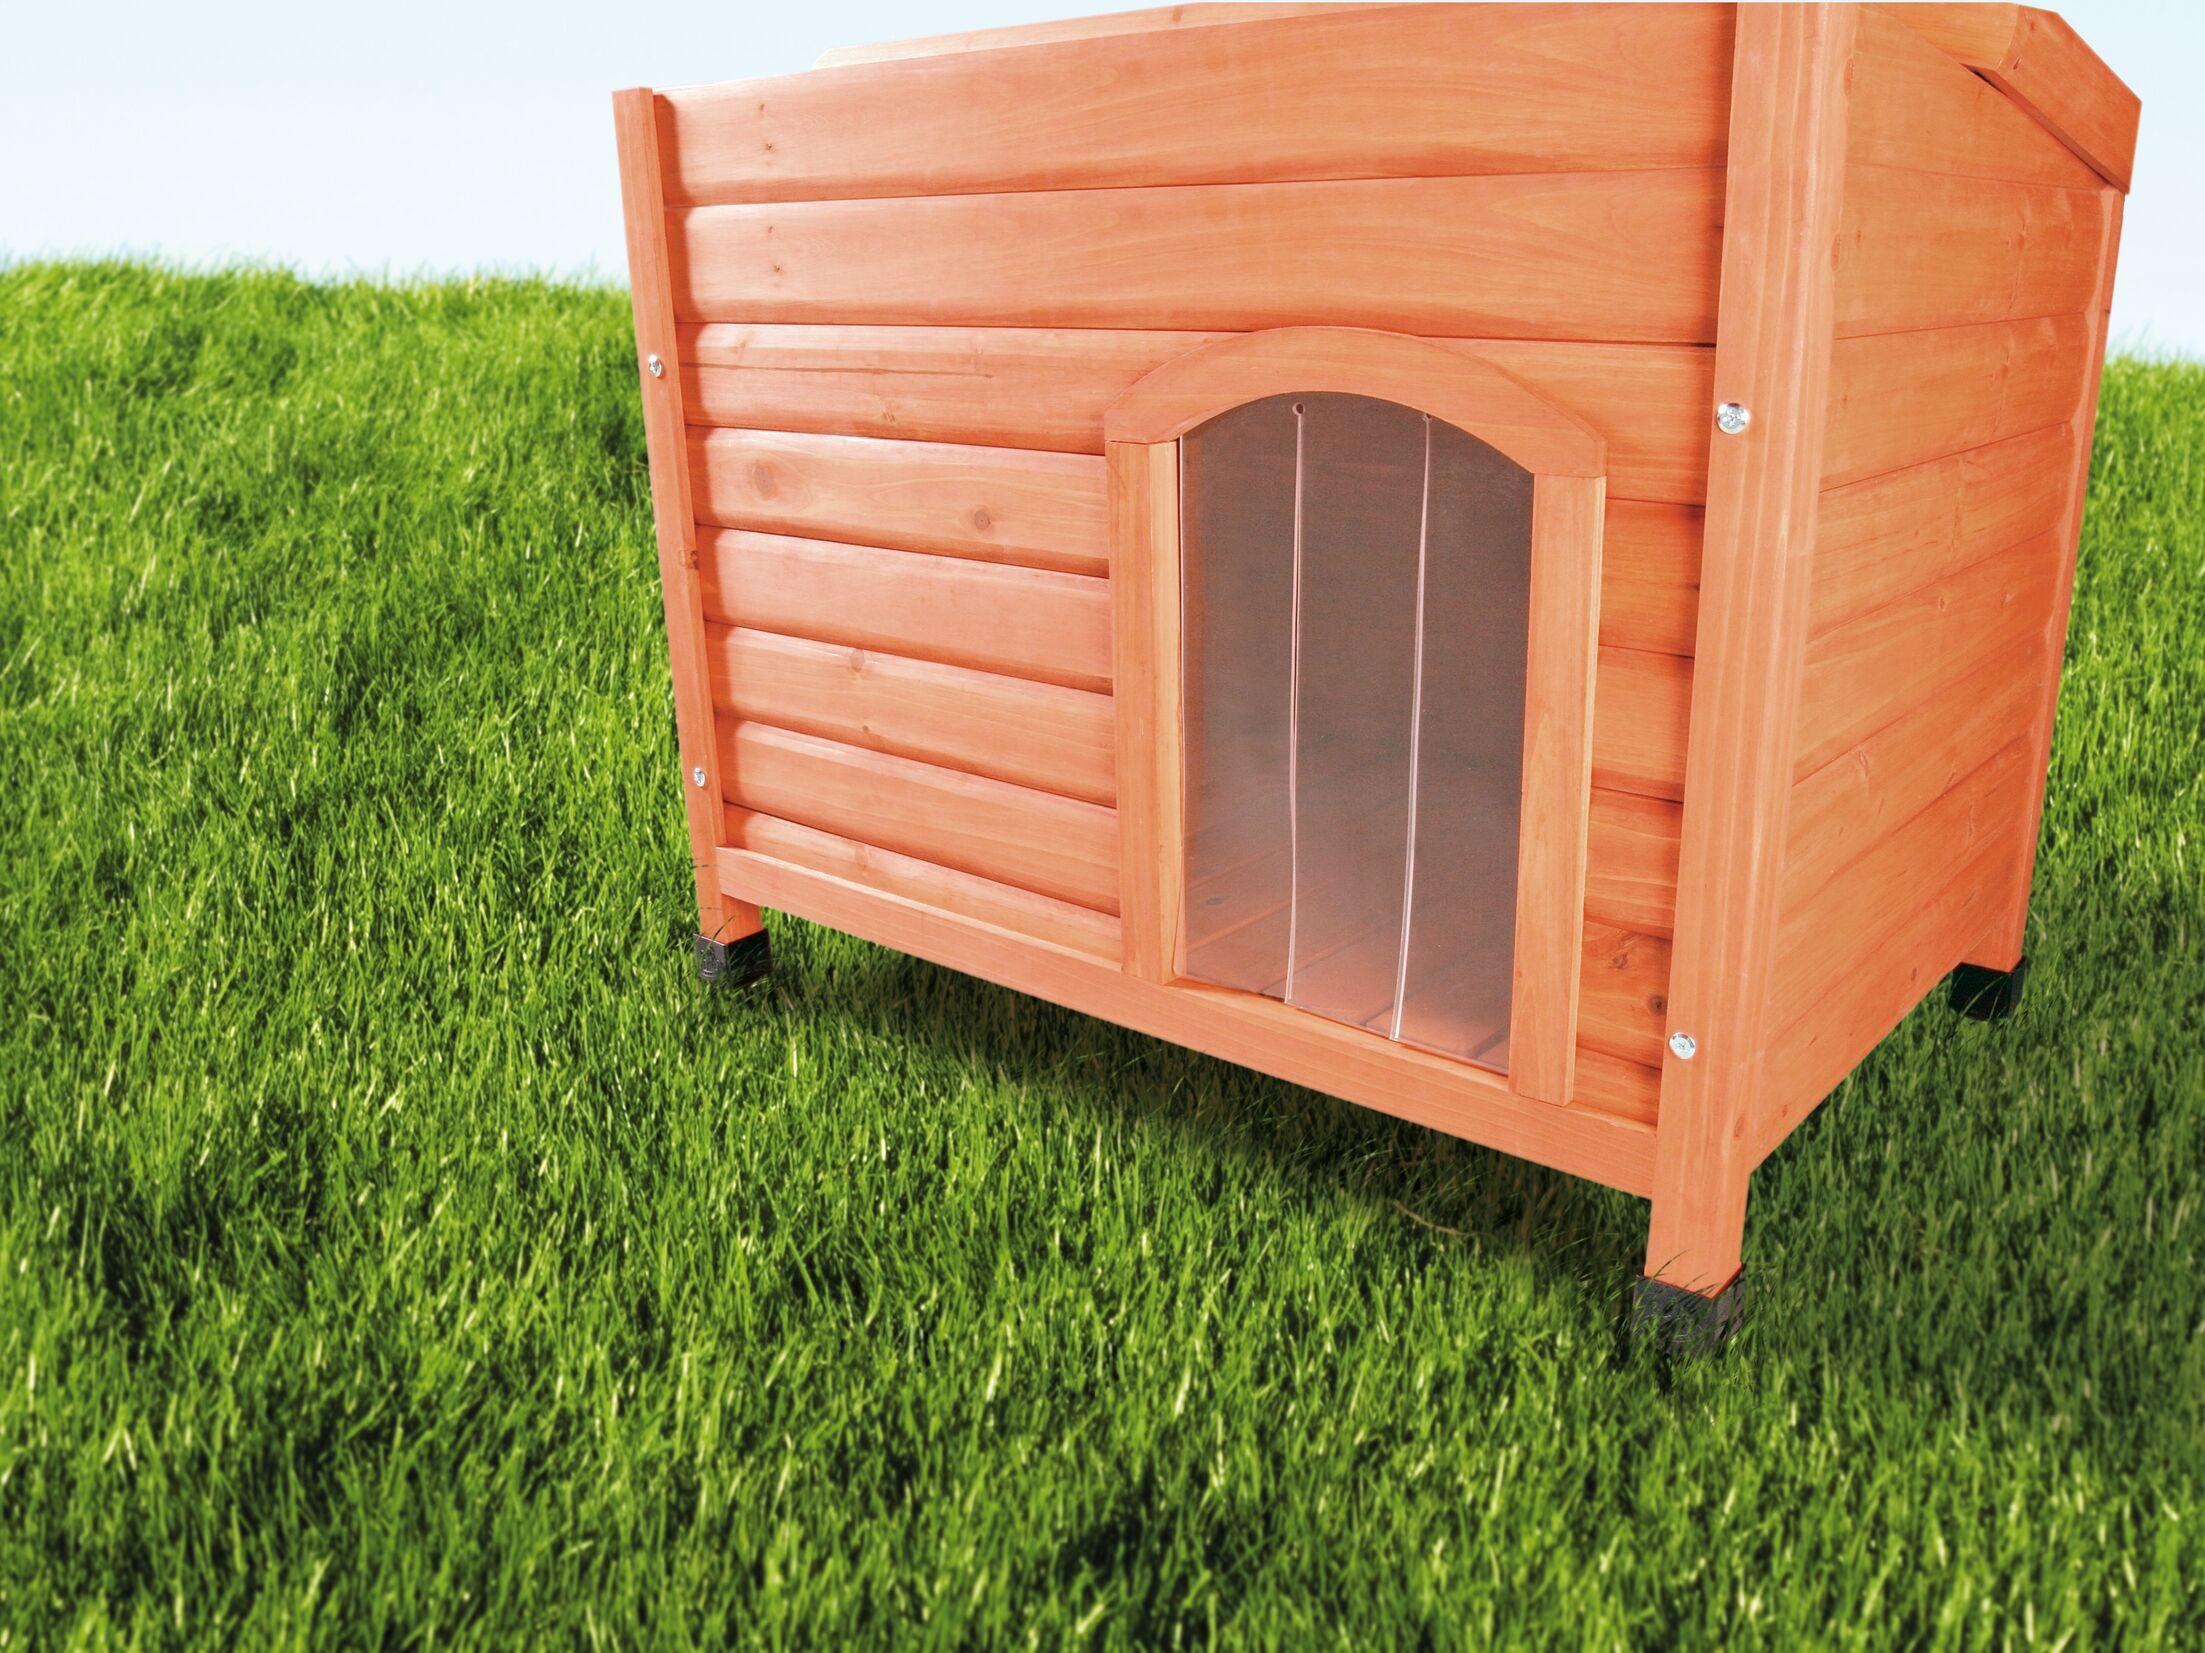 Marciano Plastic Door for Flat Roof Dog House Size: Medium (13.75